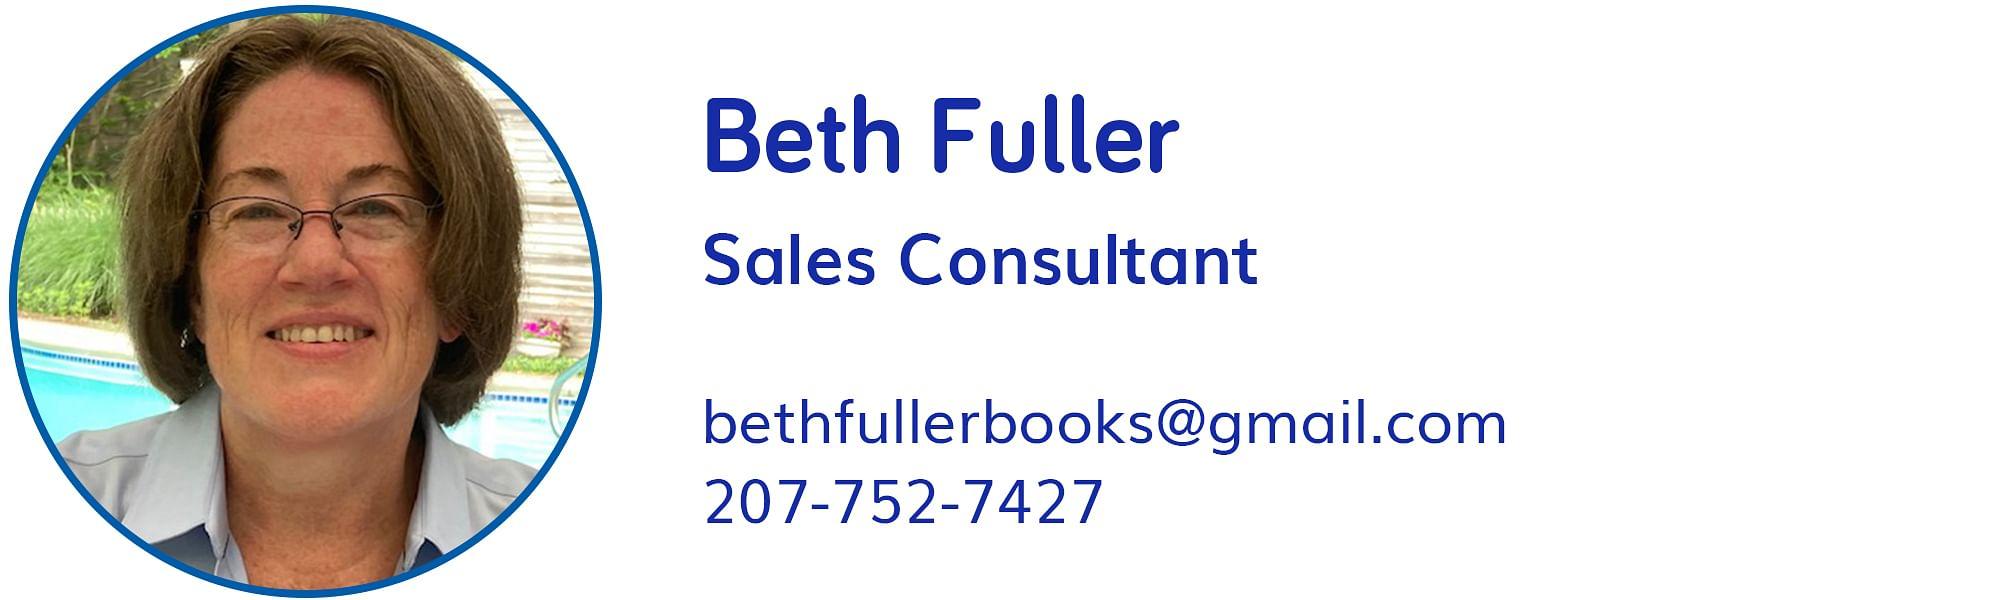 Beth Fuller, bethfullerbooks@gmail.com, 207-752-7427